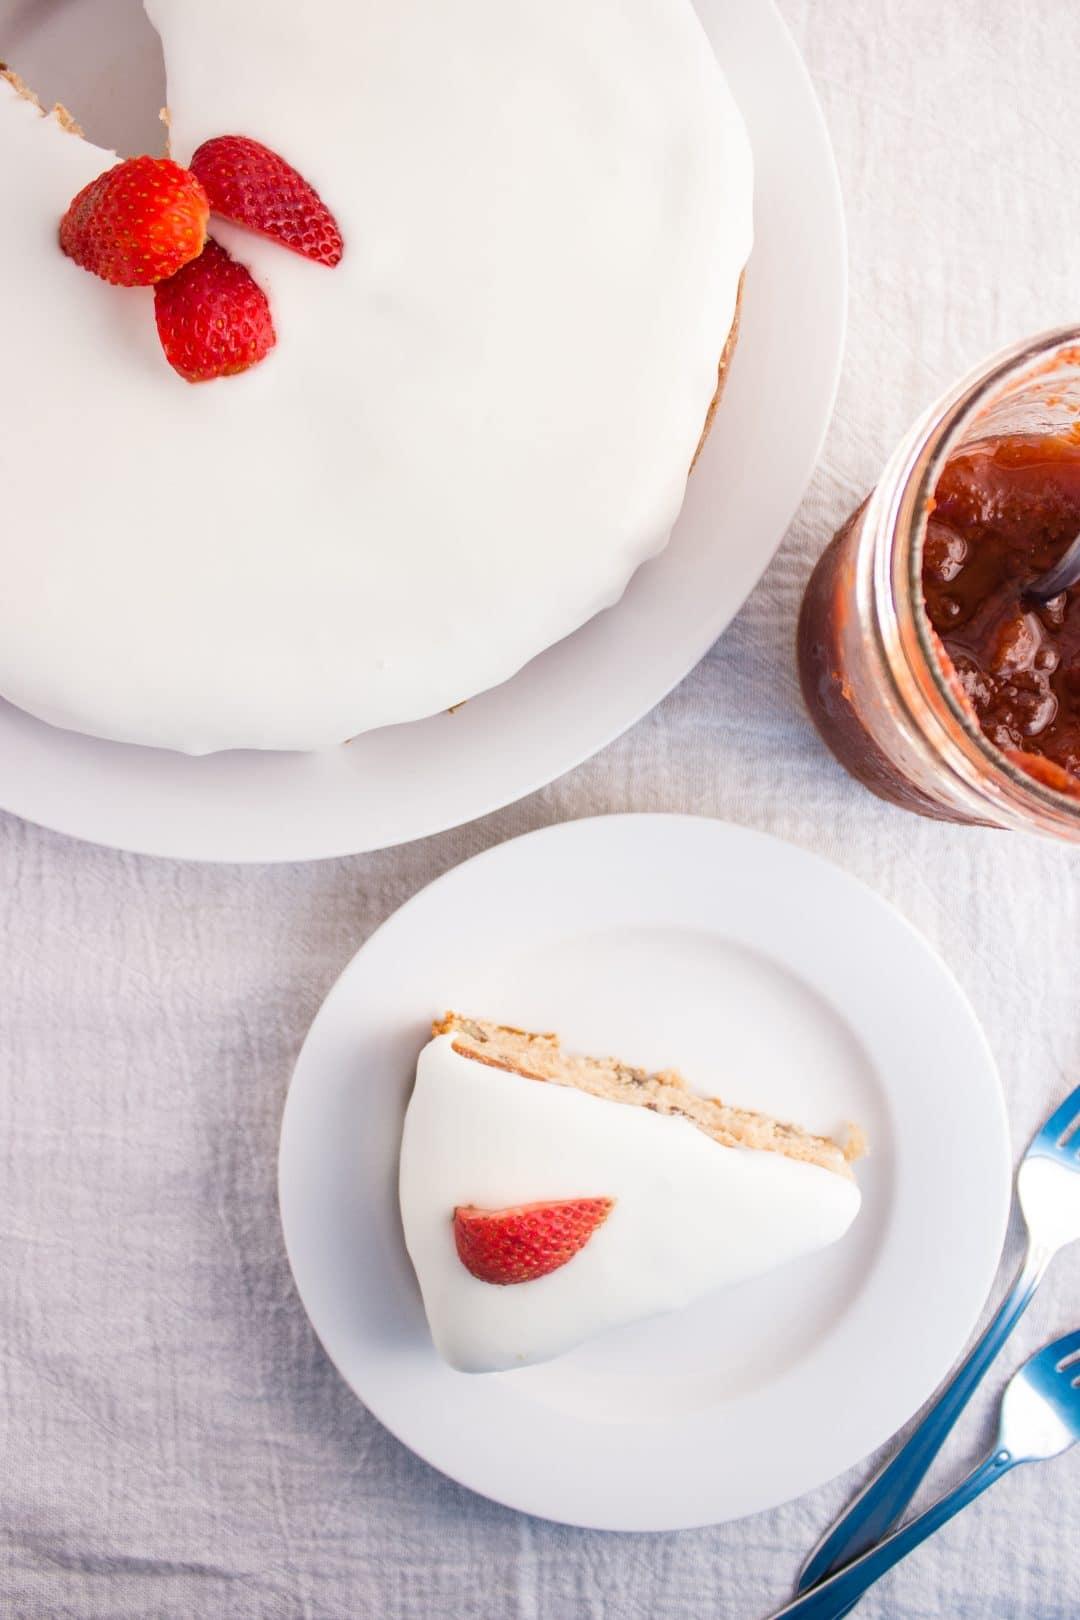 Strawberry Preserves Cake - Easy to make cake that incorporates strawberry preserves and is topped with a delicious lemon glaze. simplylakita.com #cake #strawberrypreserves